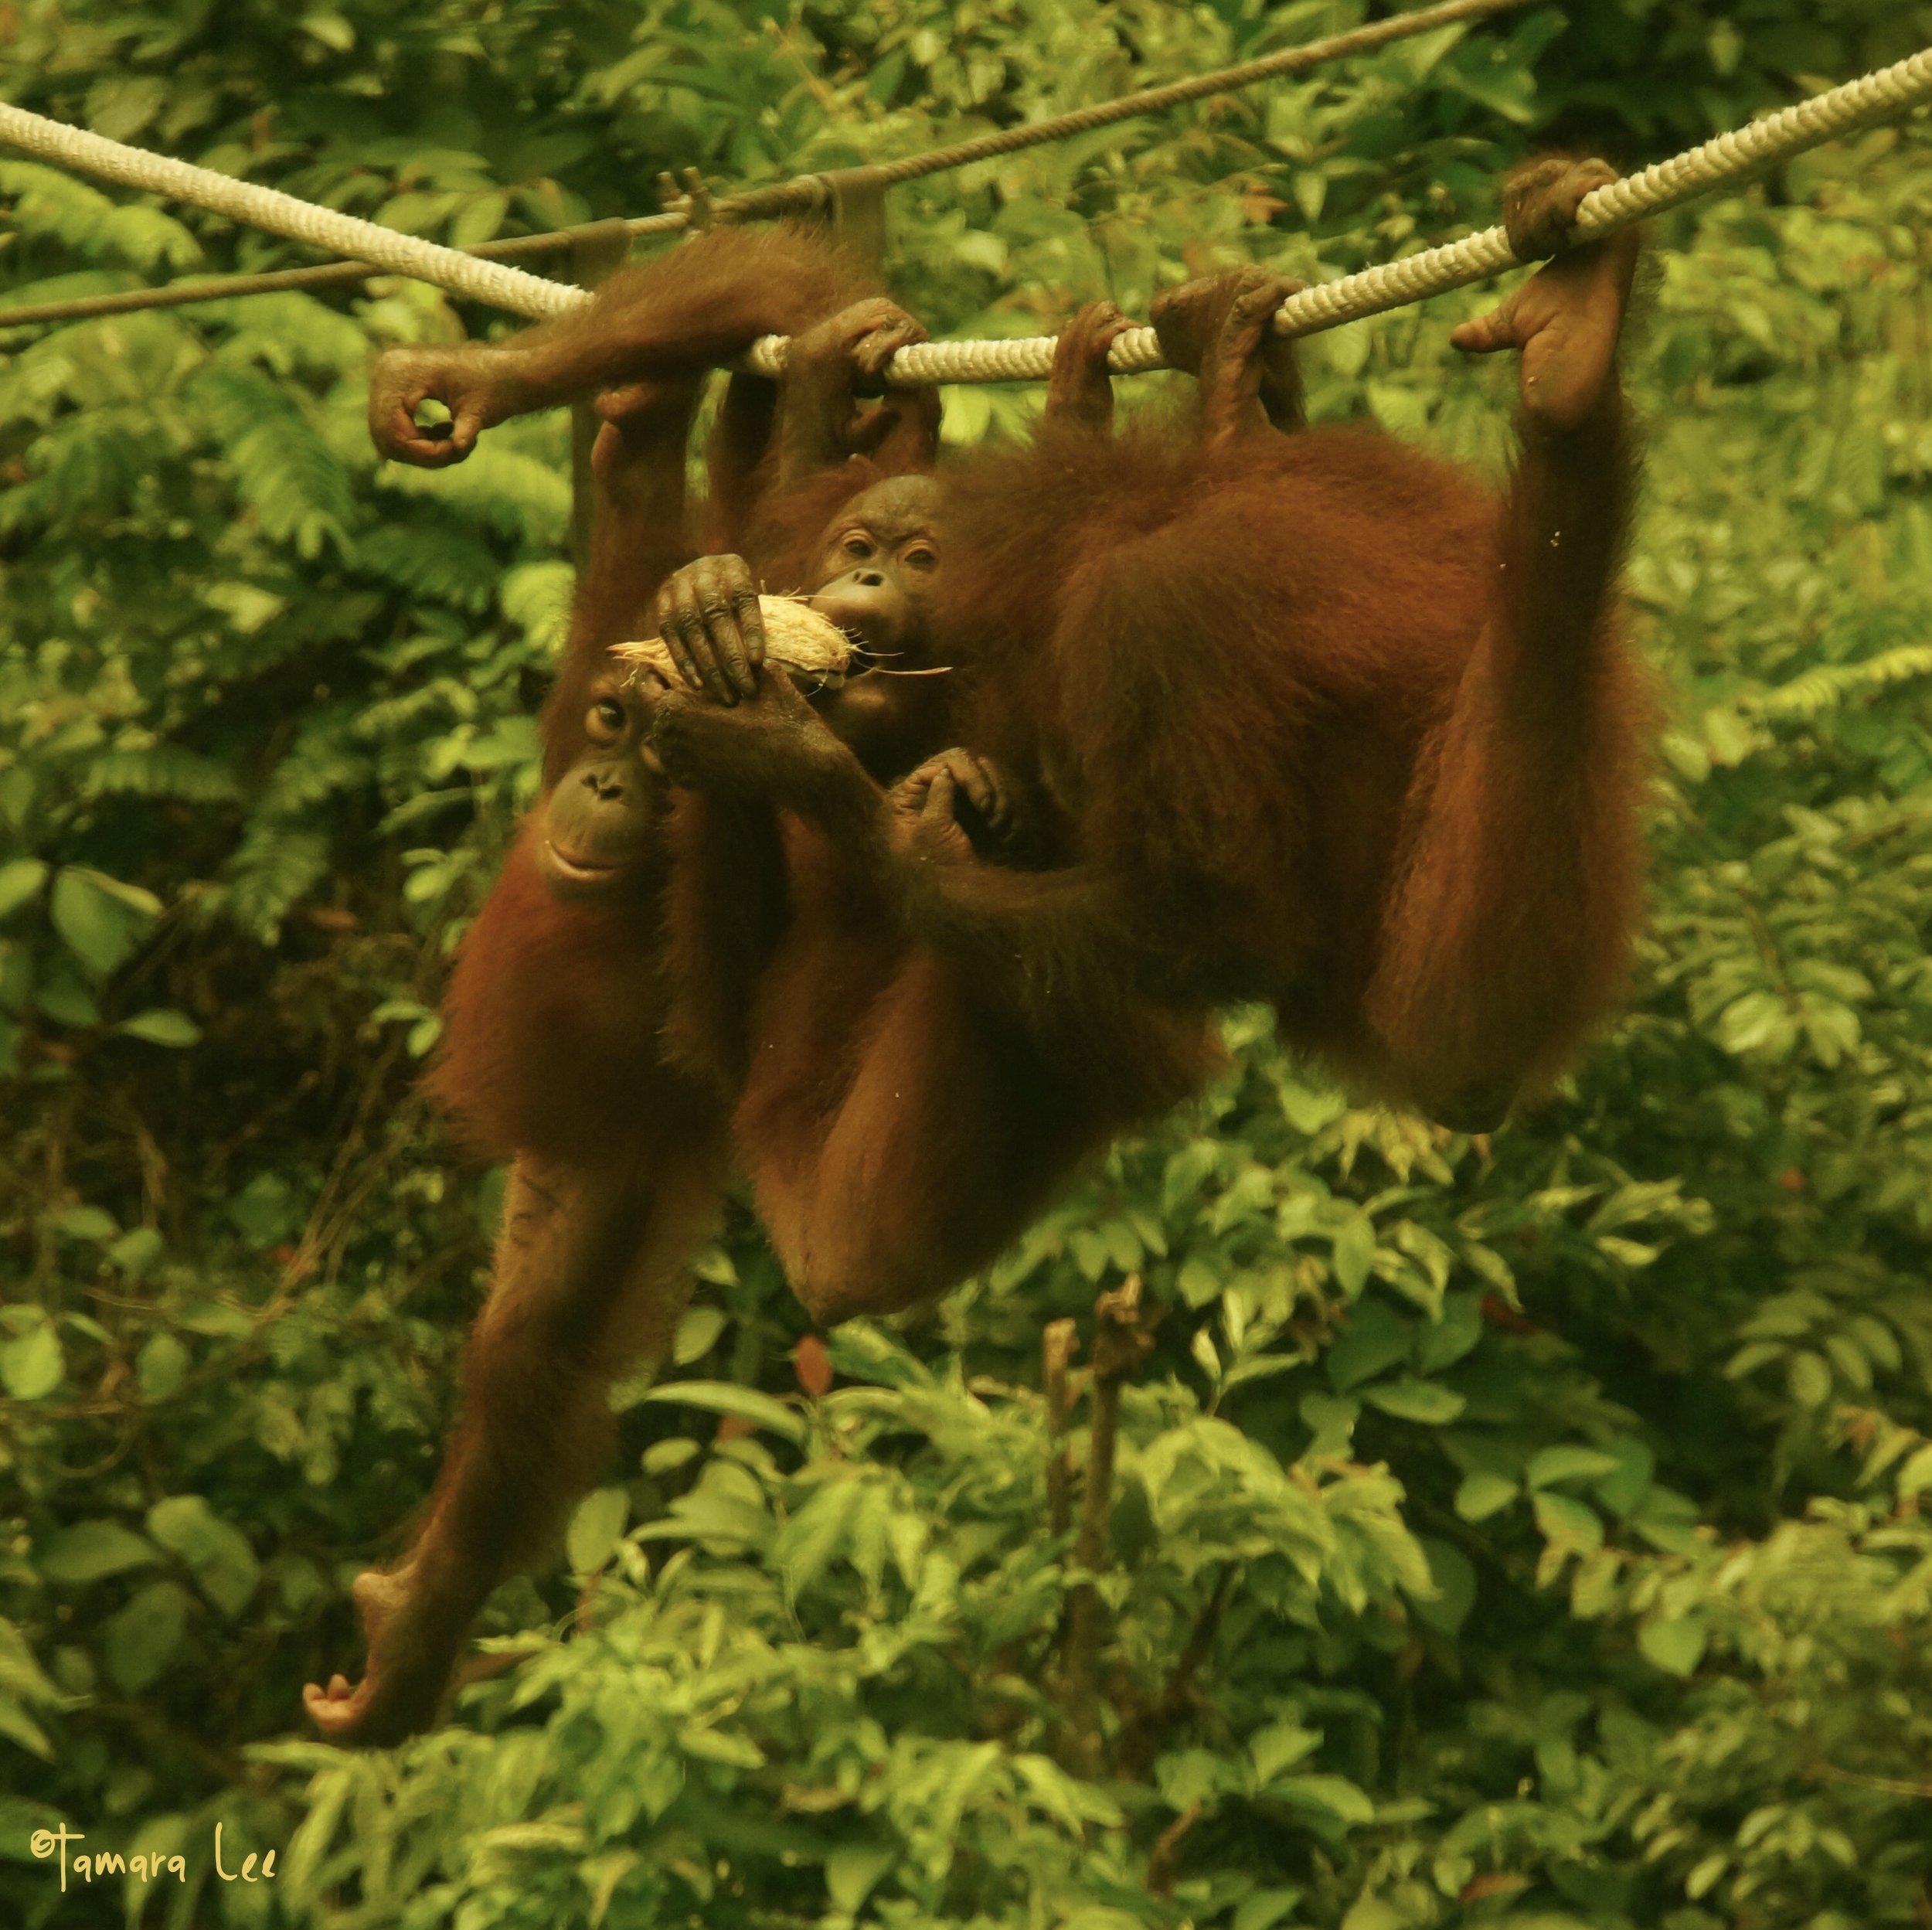 just orangutan-ing around